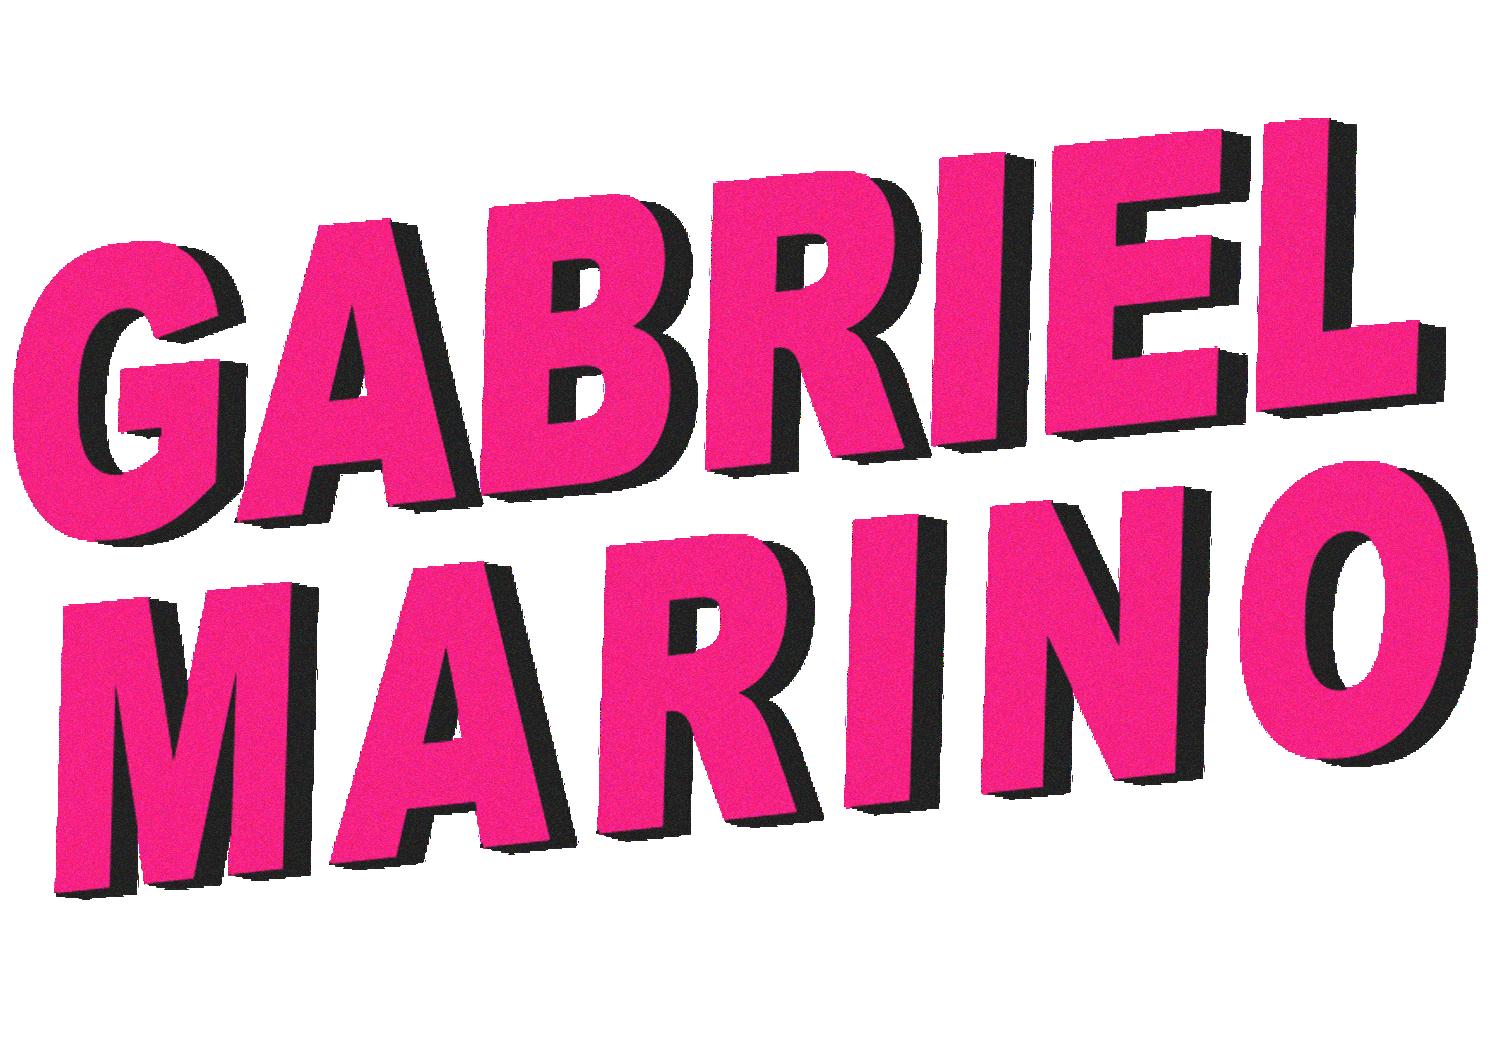 Gabriel Marino